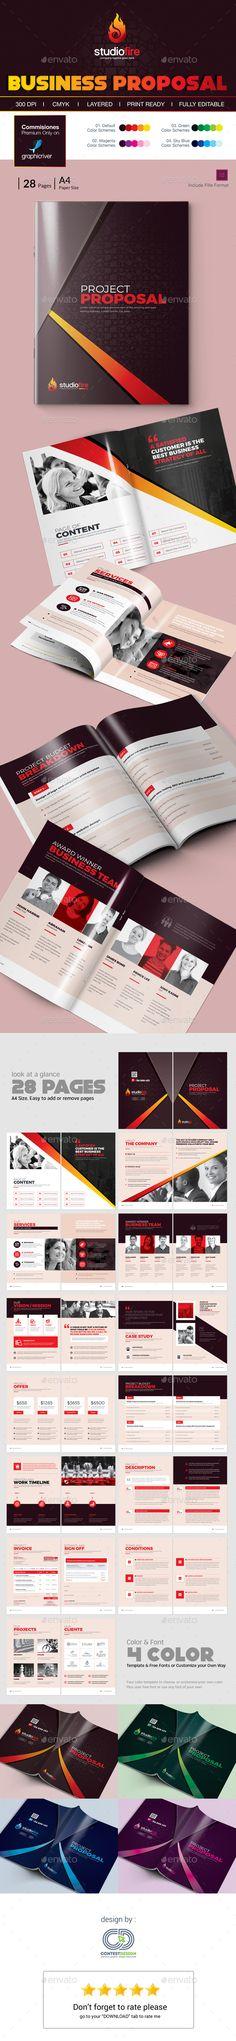 Questionnaire Web Design Proposal Proposals, Brochures and - design proposal